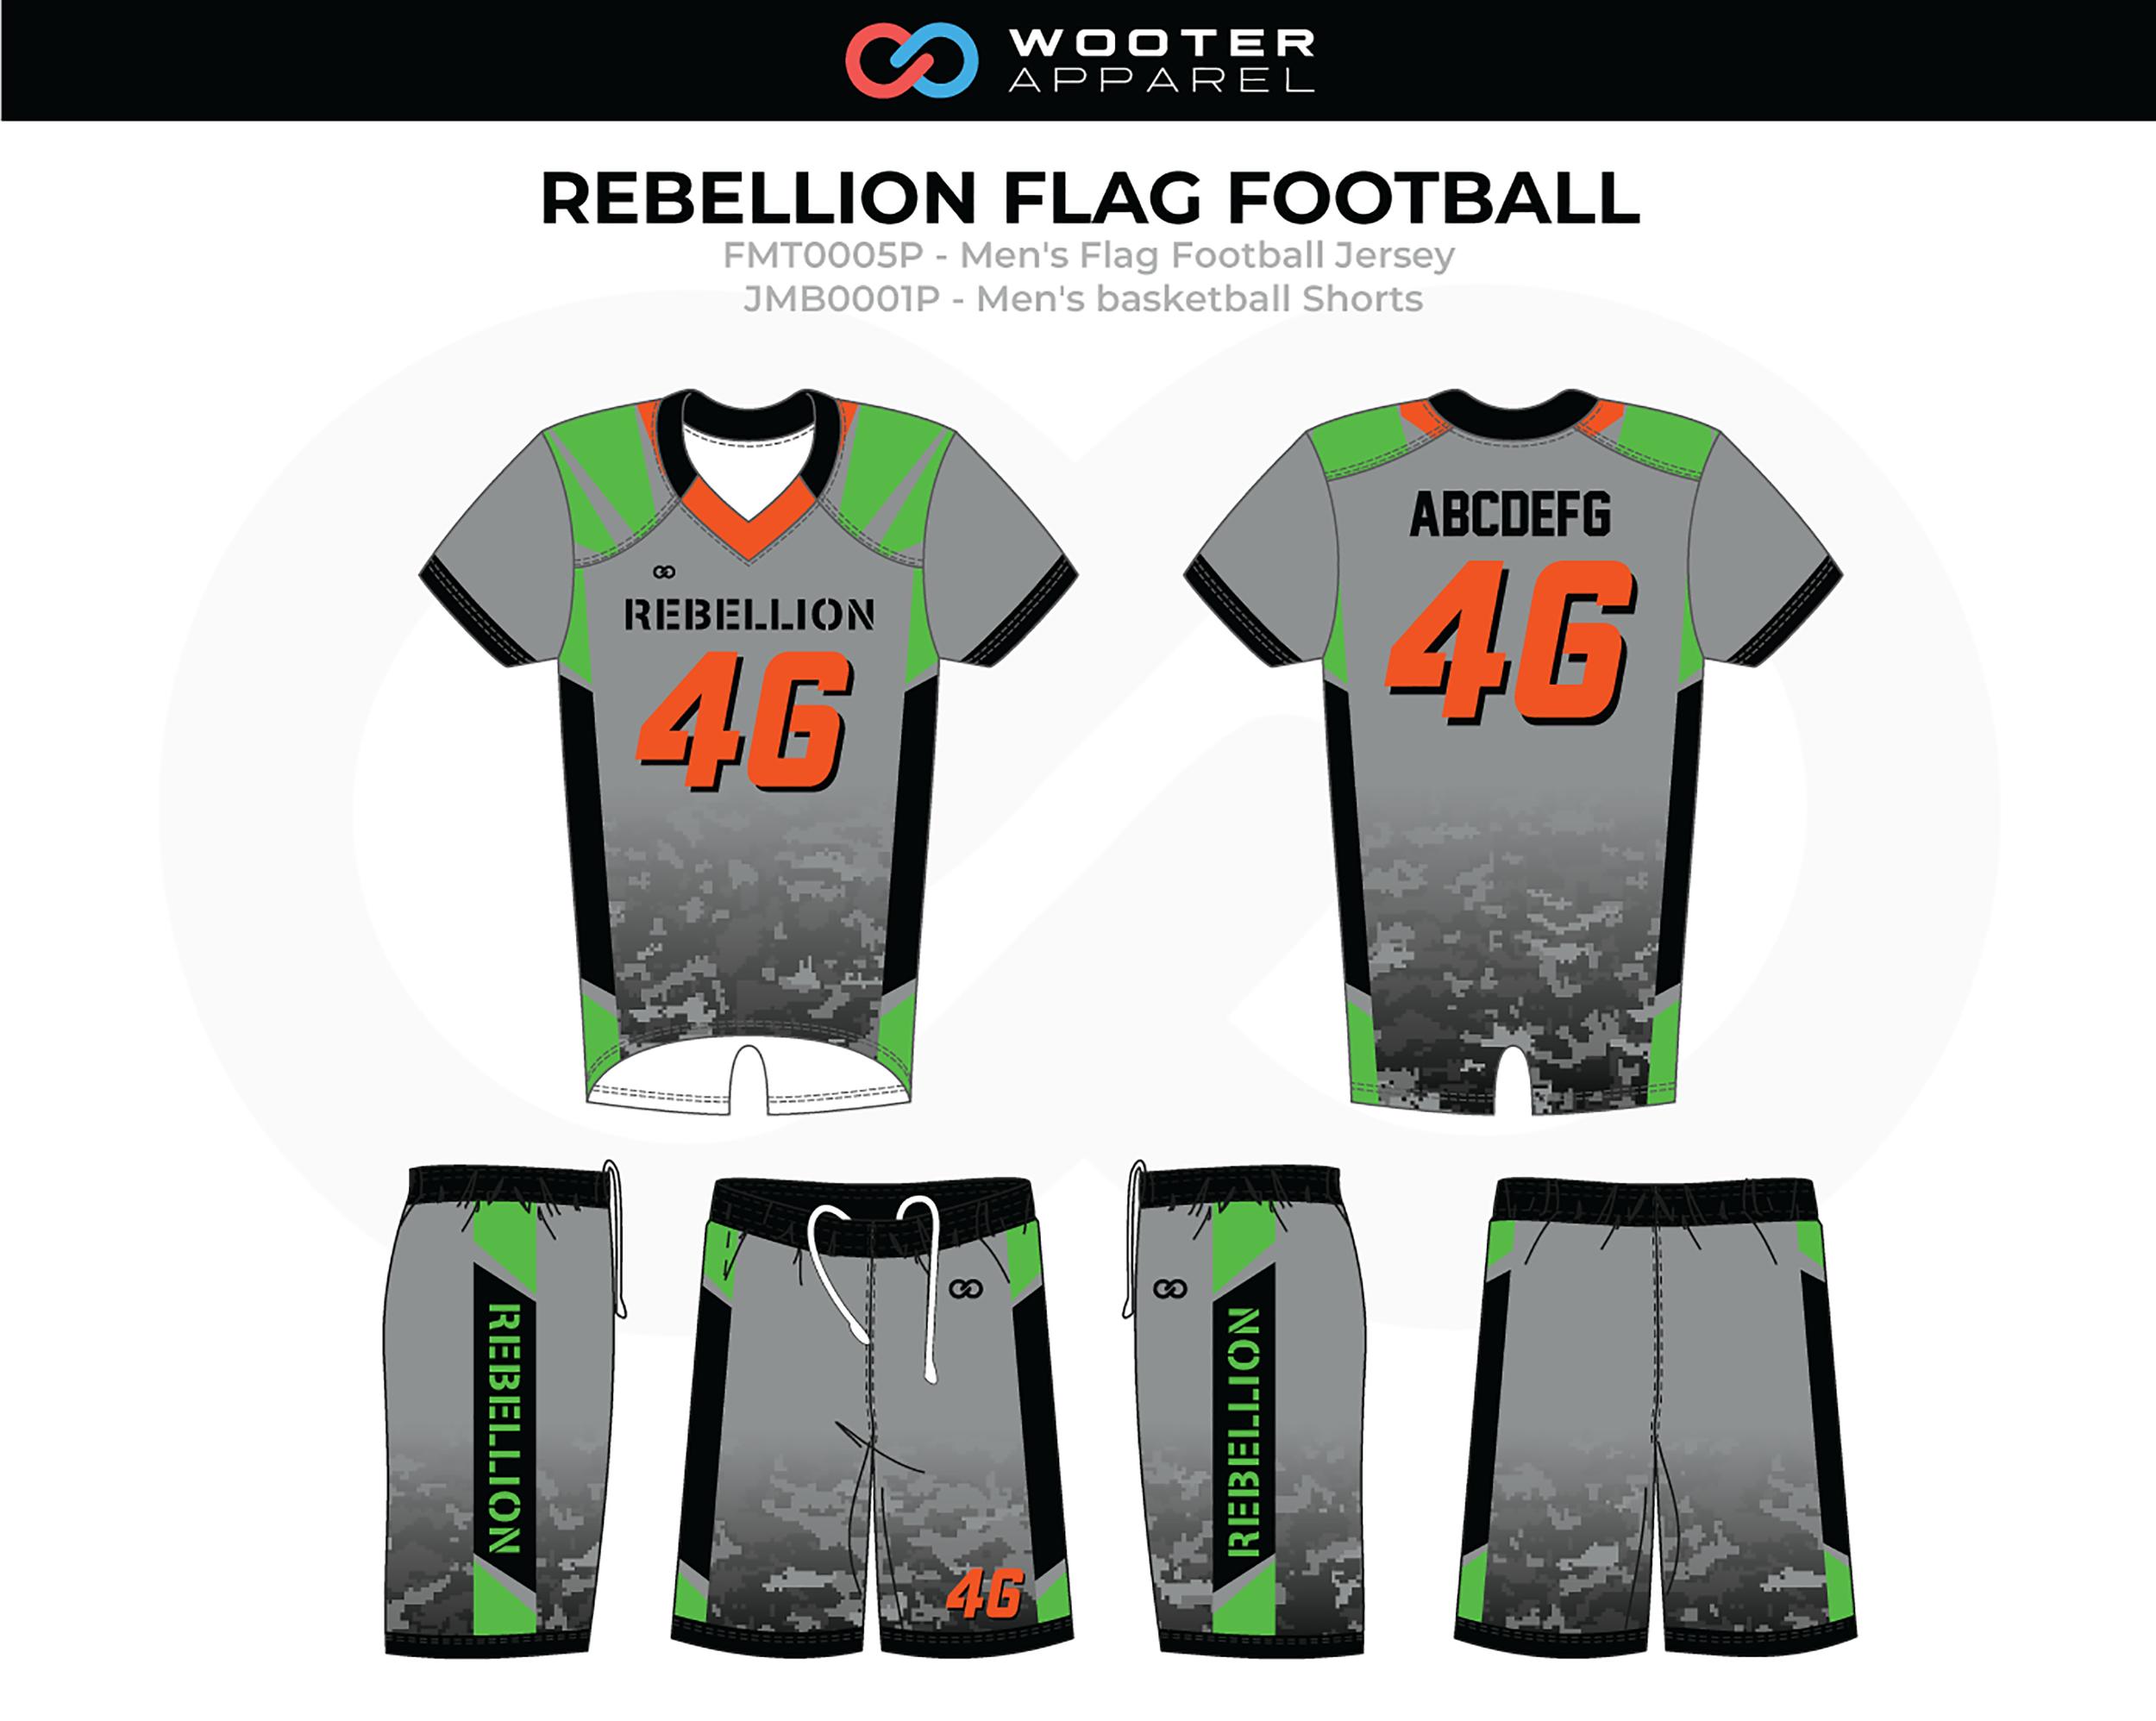 RebellionFlagFootball_MockupV1.png